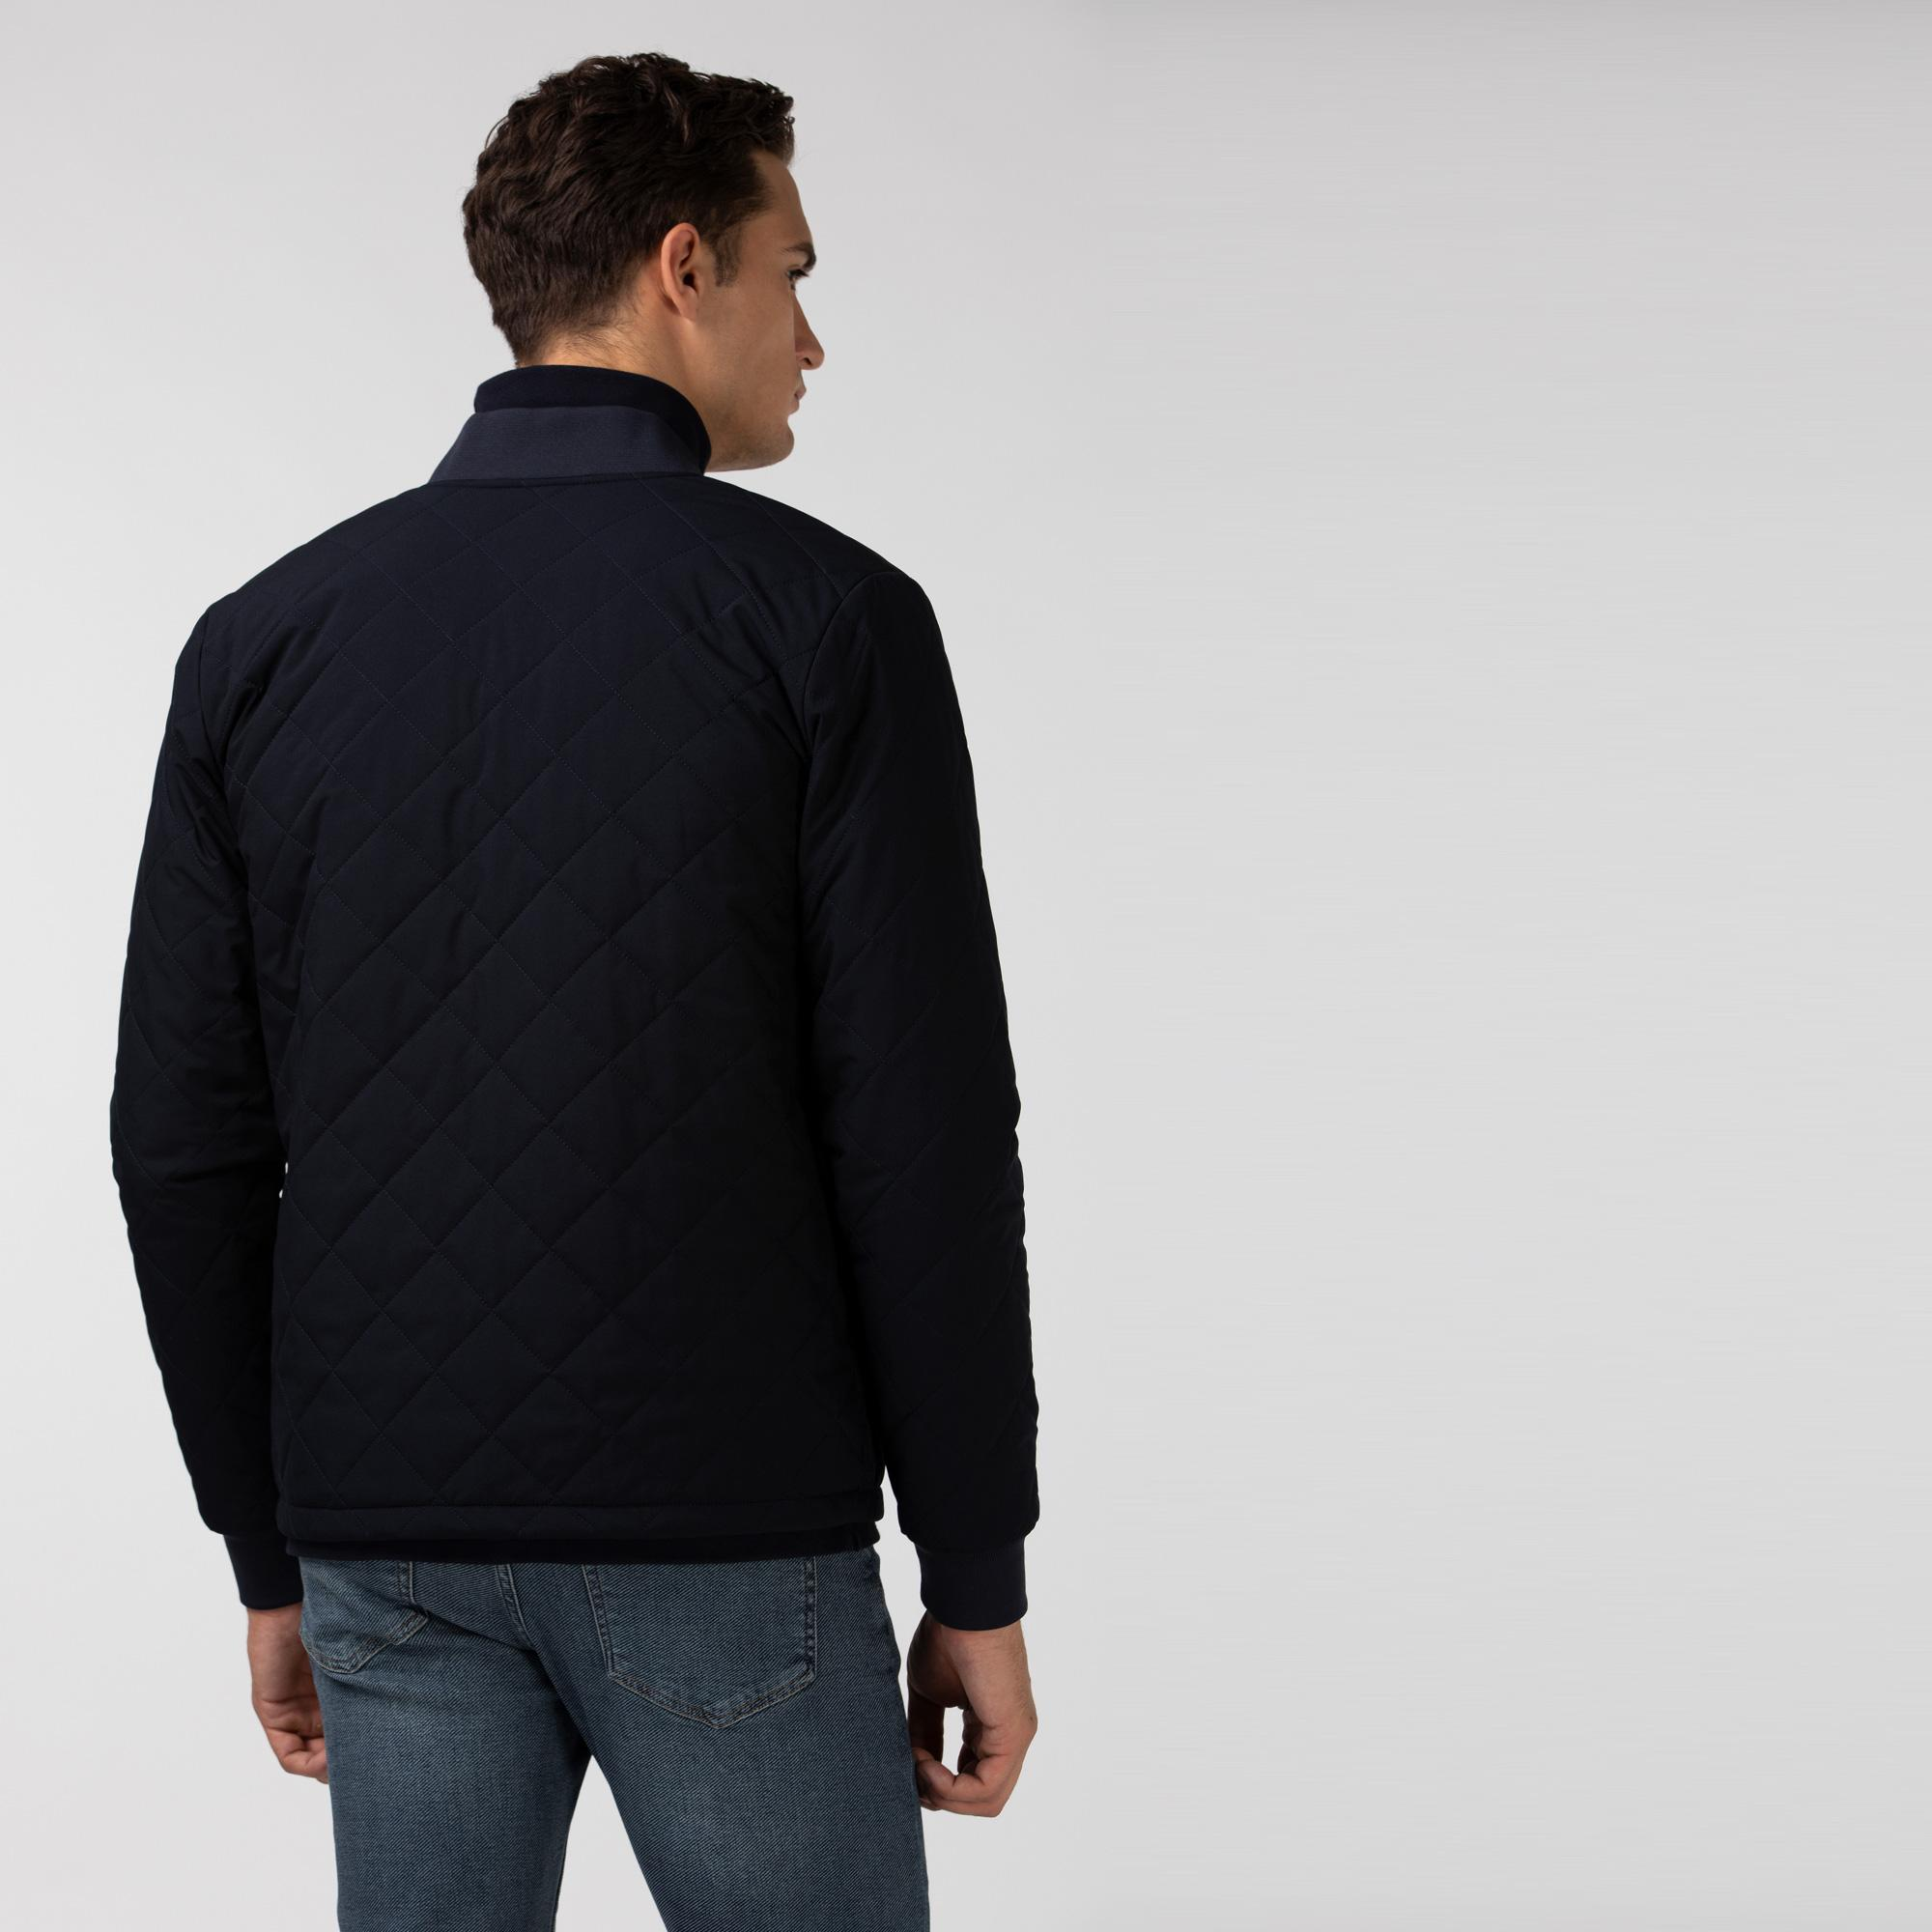 Lacoste Erkek Kapitone Lacivert Sweatshirt/Ceket